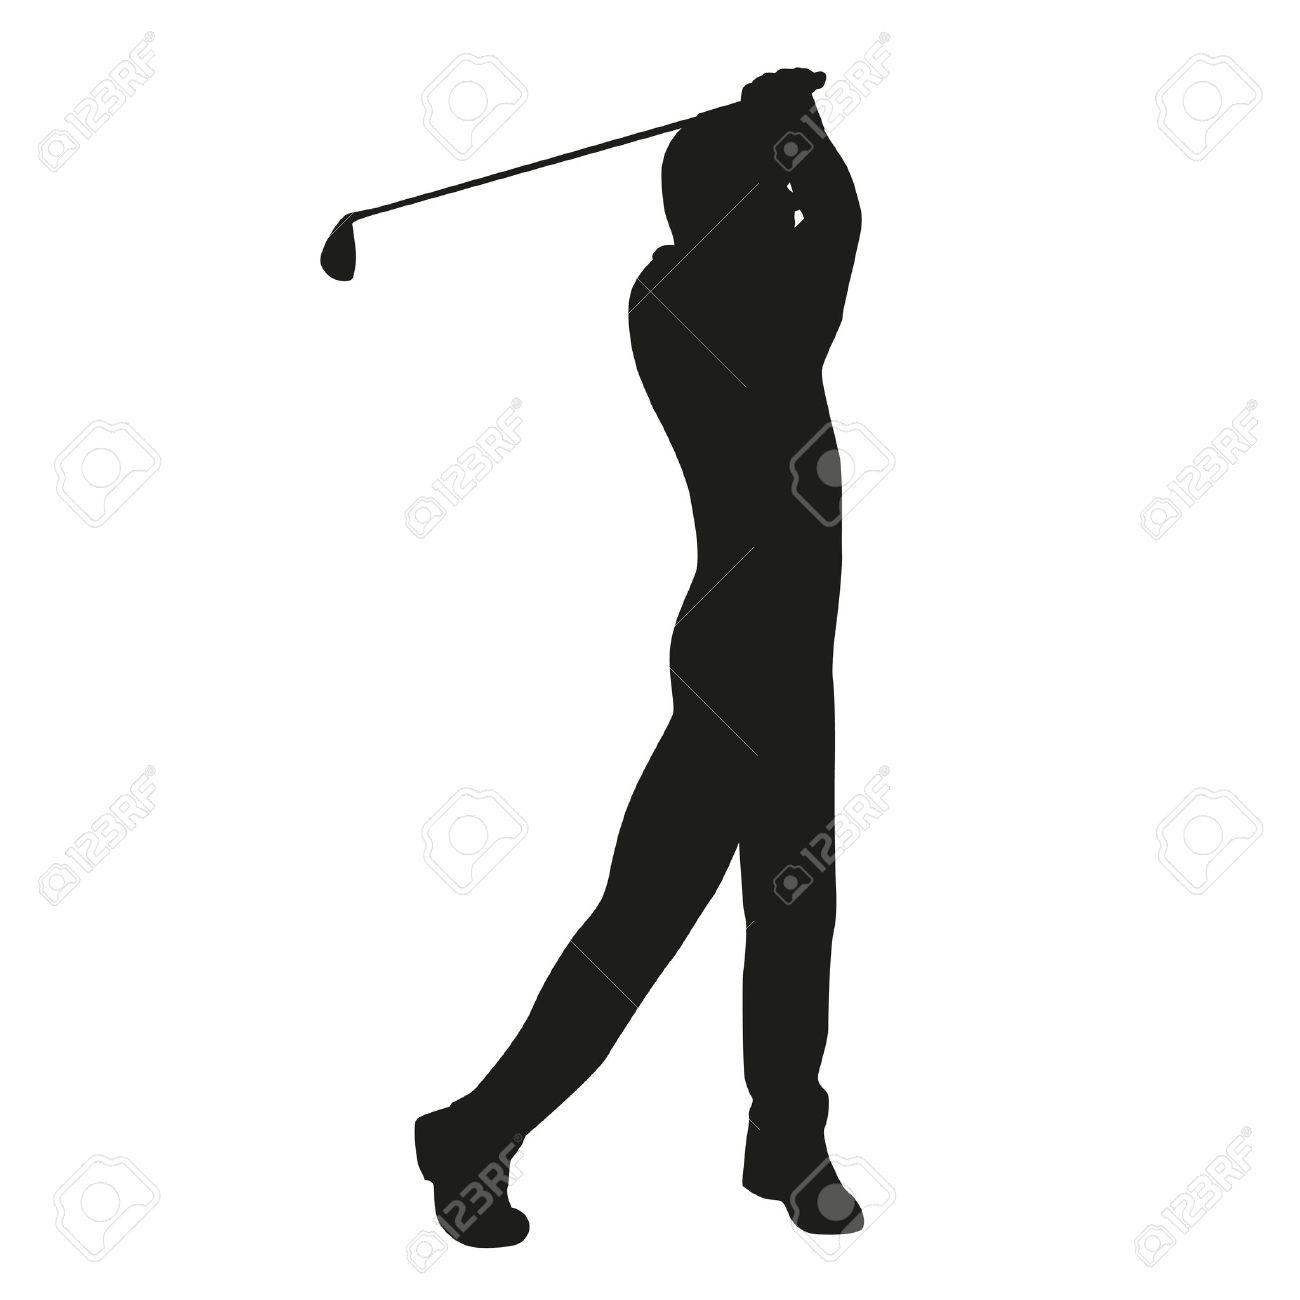 golf swing vector golfer silhouette royalty free cliparts vectors rh 123rf com vector golf ball icon vector golf course